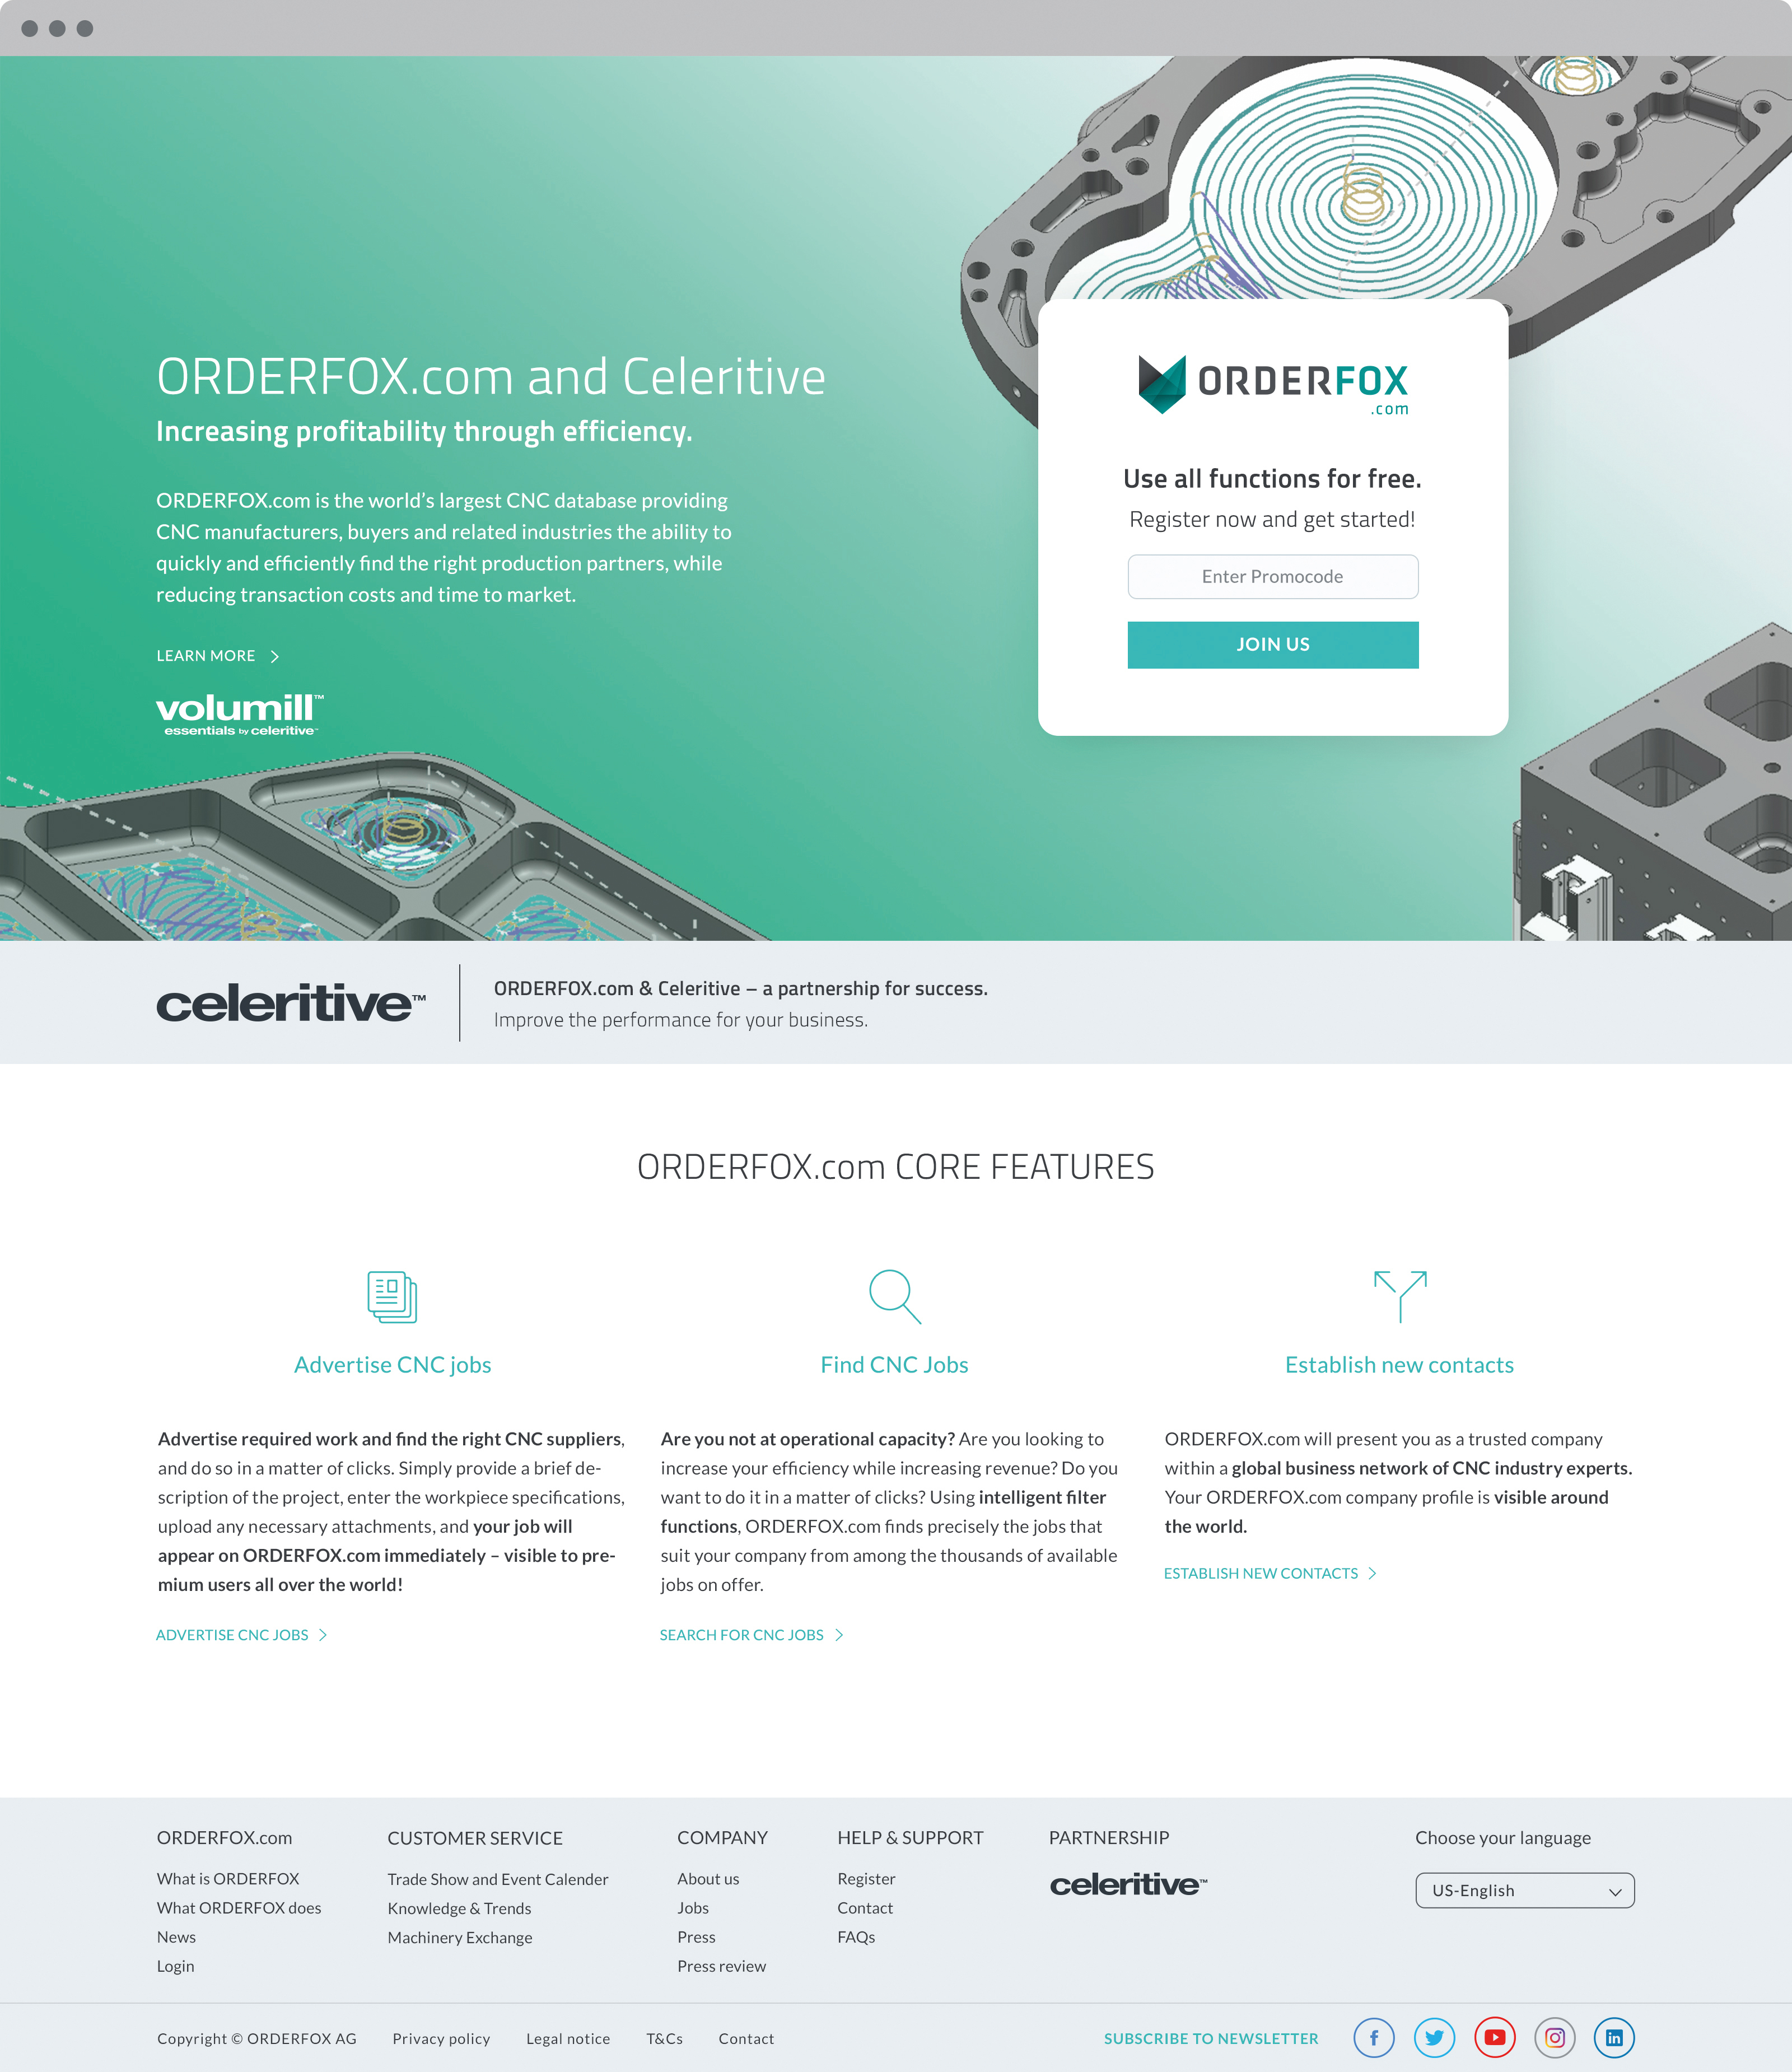 Celeritive Technologies Signs Strategic Partnership with ORDERFOX ...